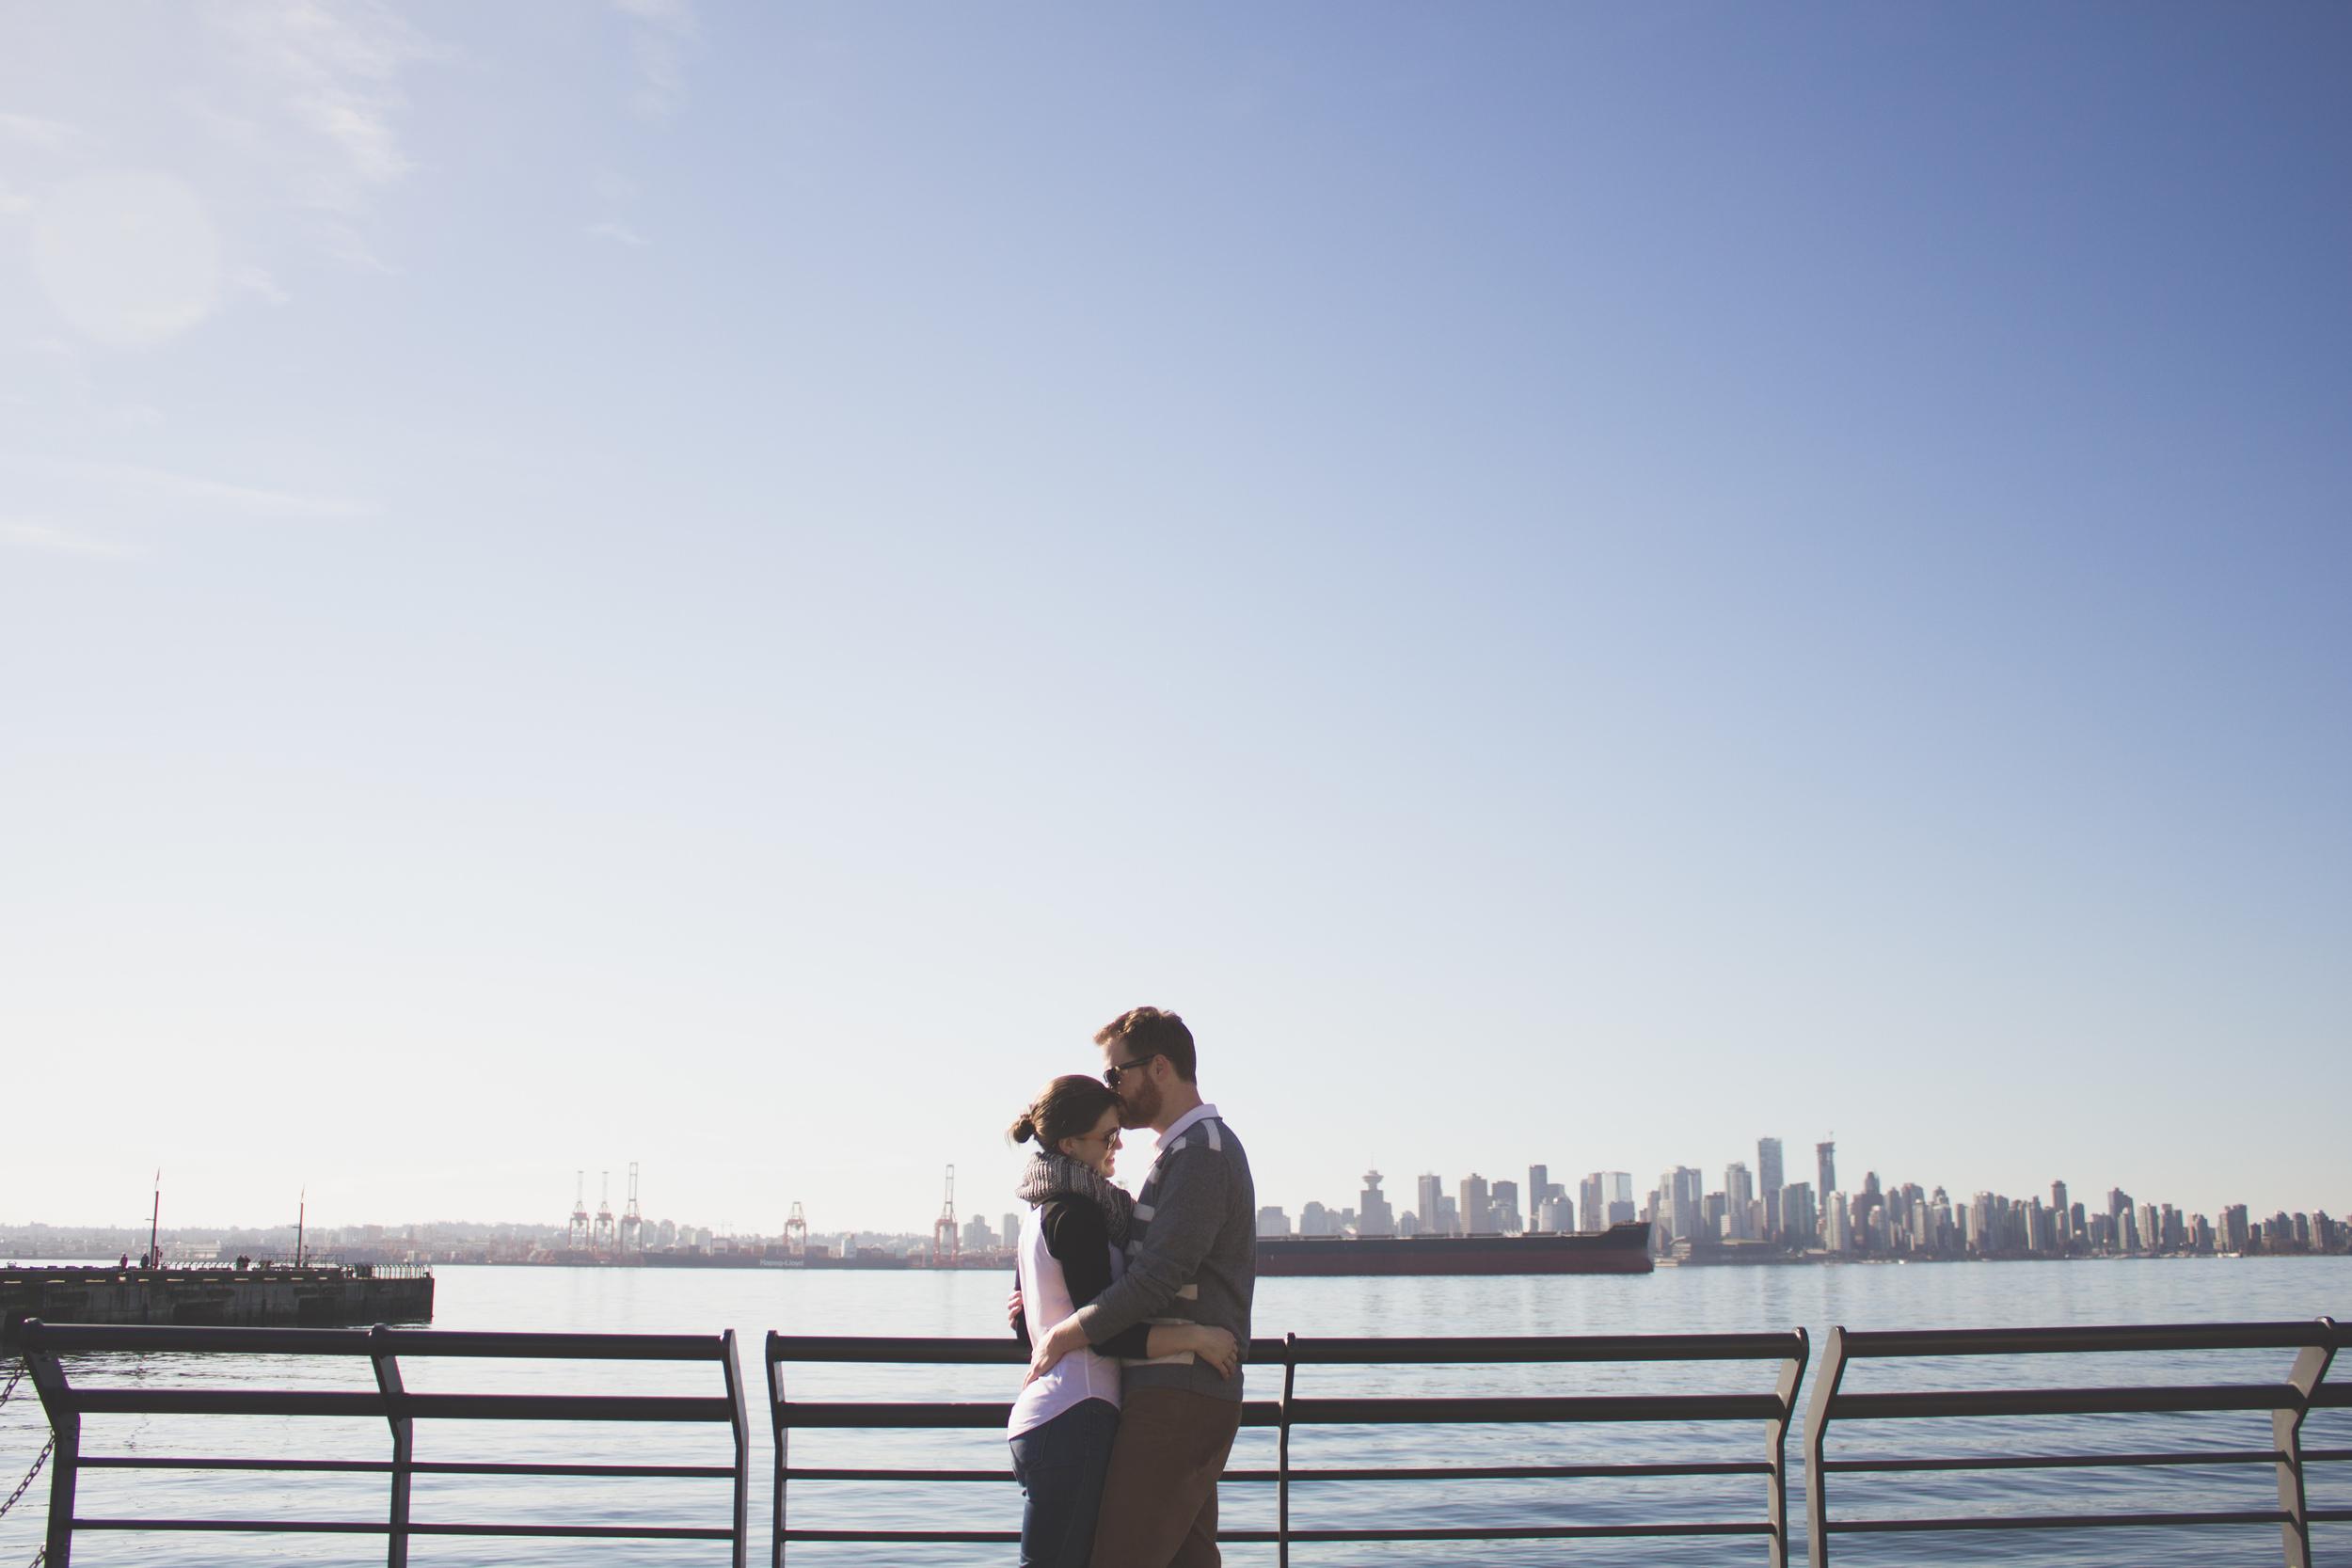 vancouver_photographer_couple_engagement_rk-11.jpg